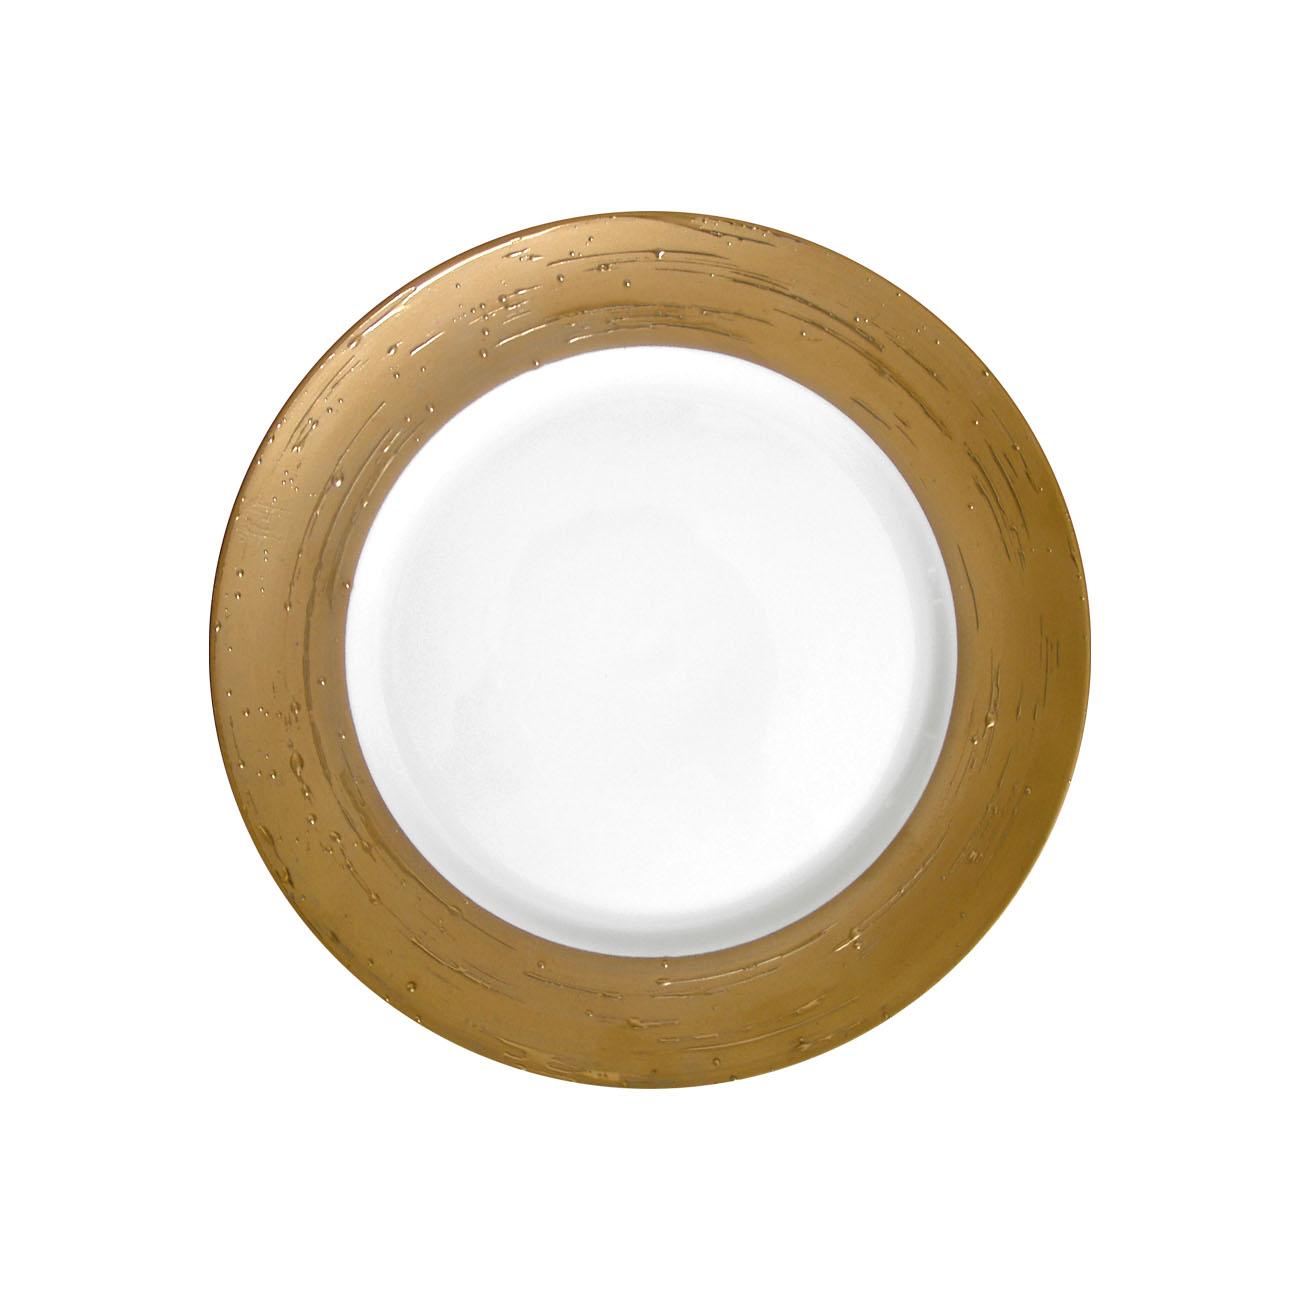 Porcel Auratus OB Dinnerware | Borsheims